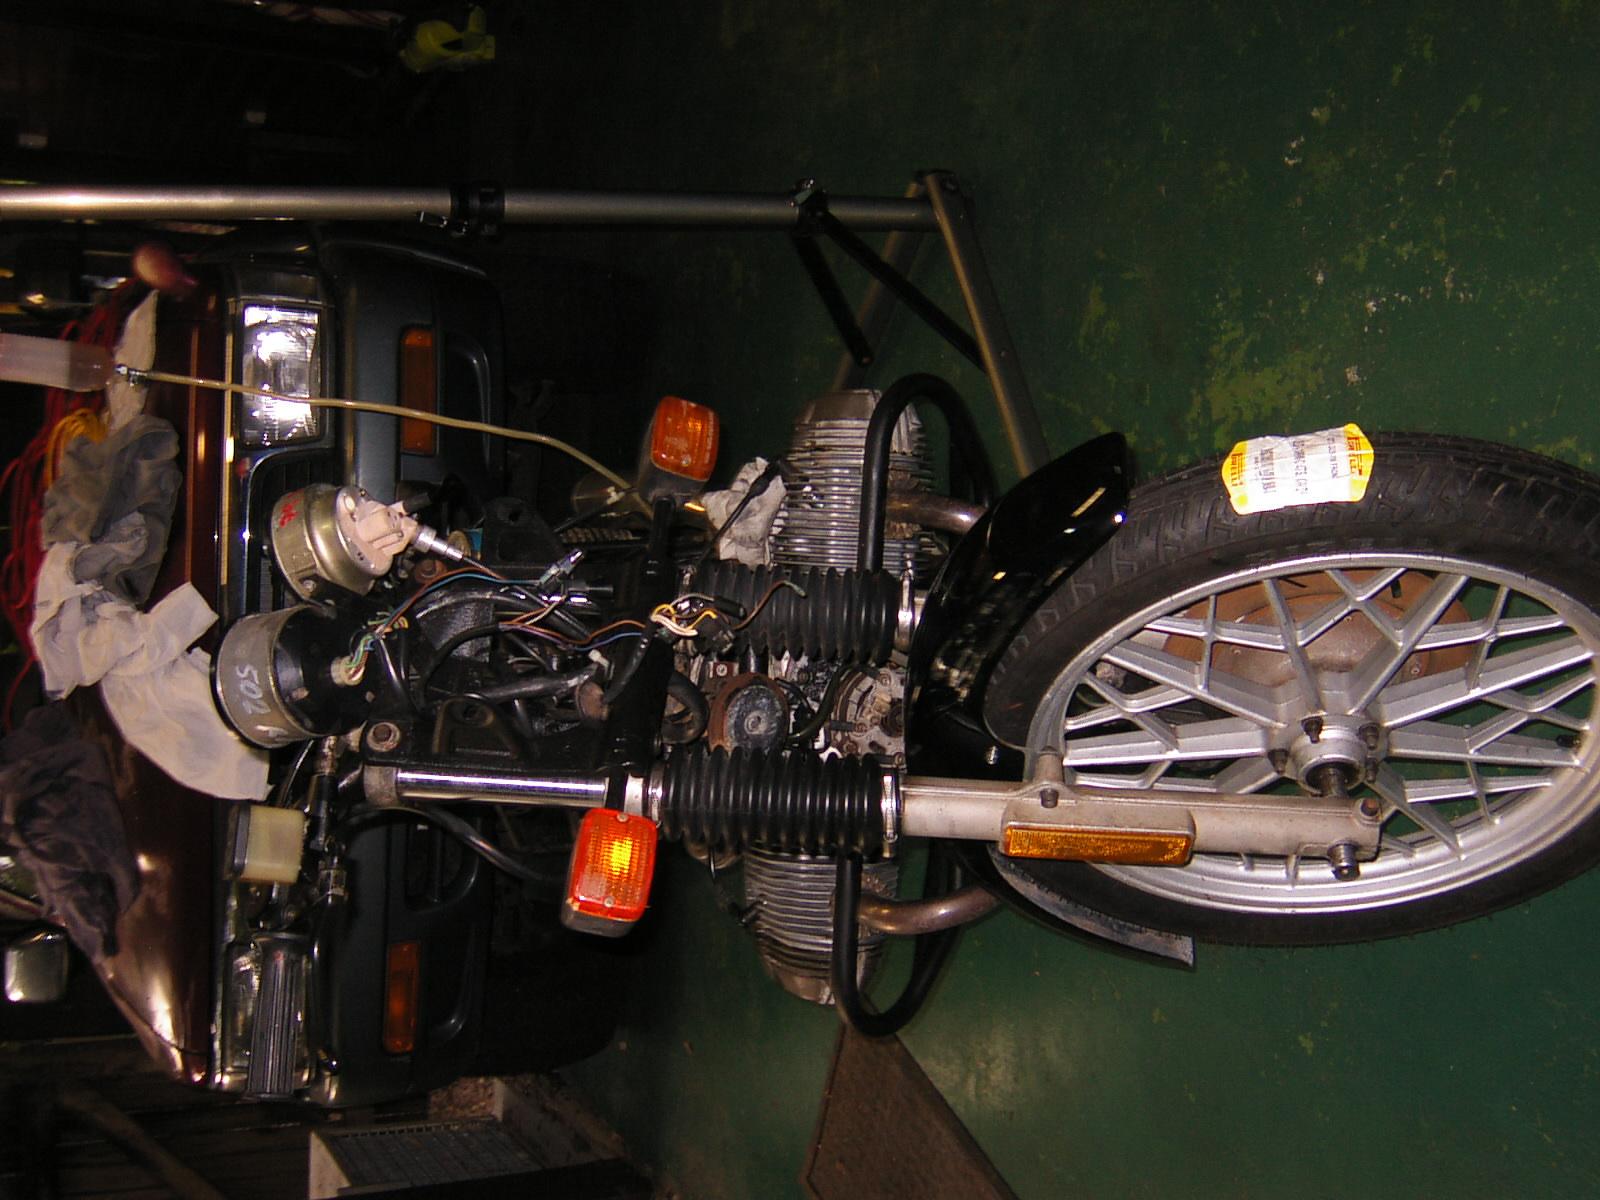 P1070129.JPG